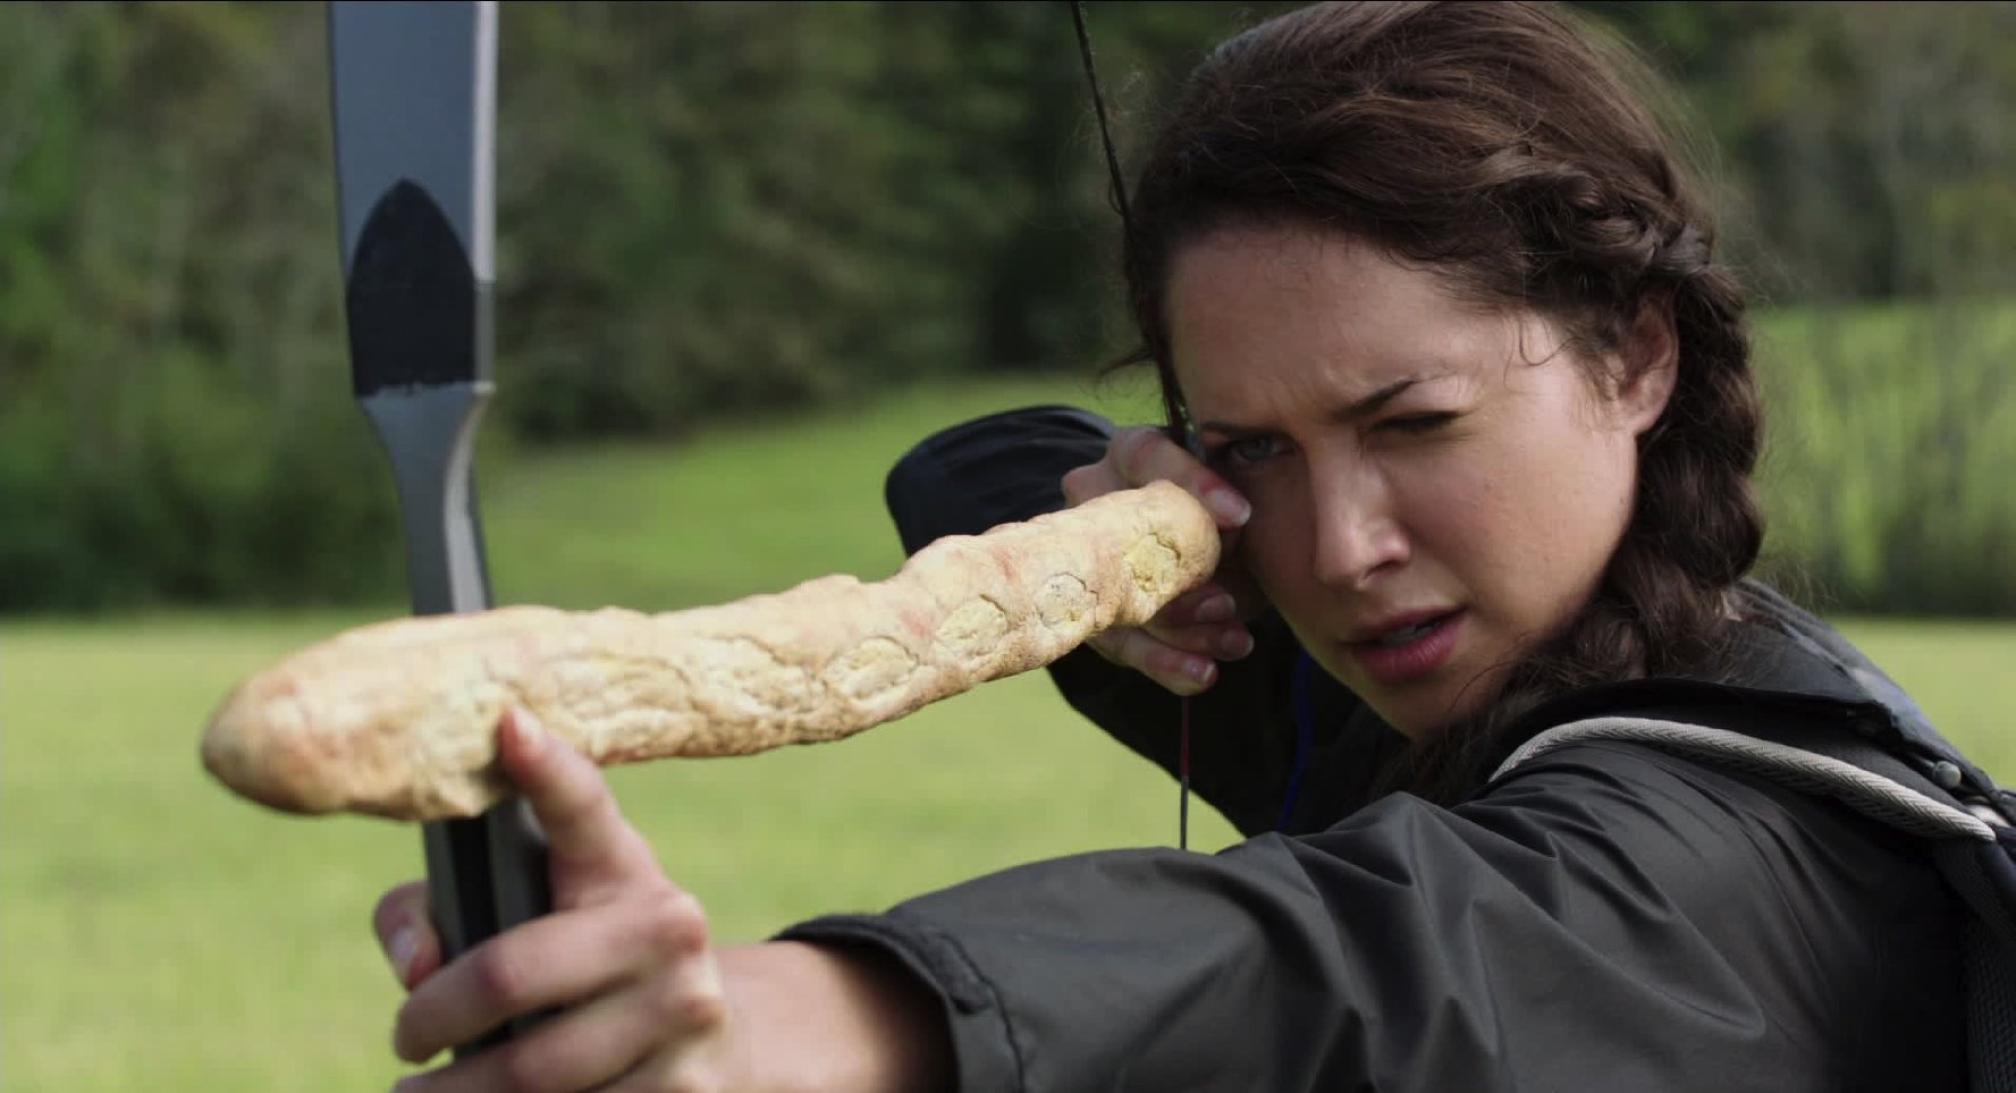 Maiara Walsh as Kantmiss Evershot in The Starving Games (2013)